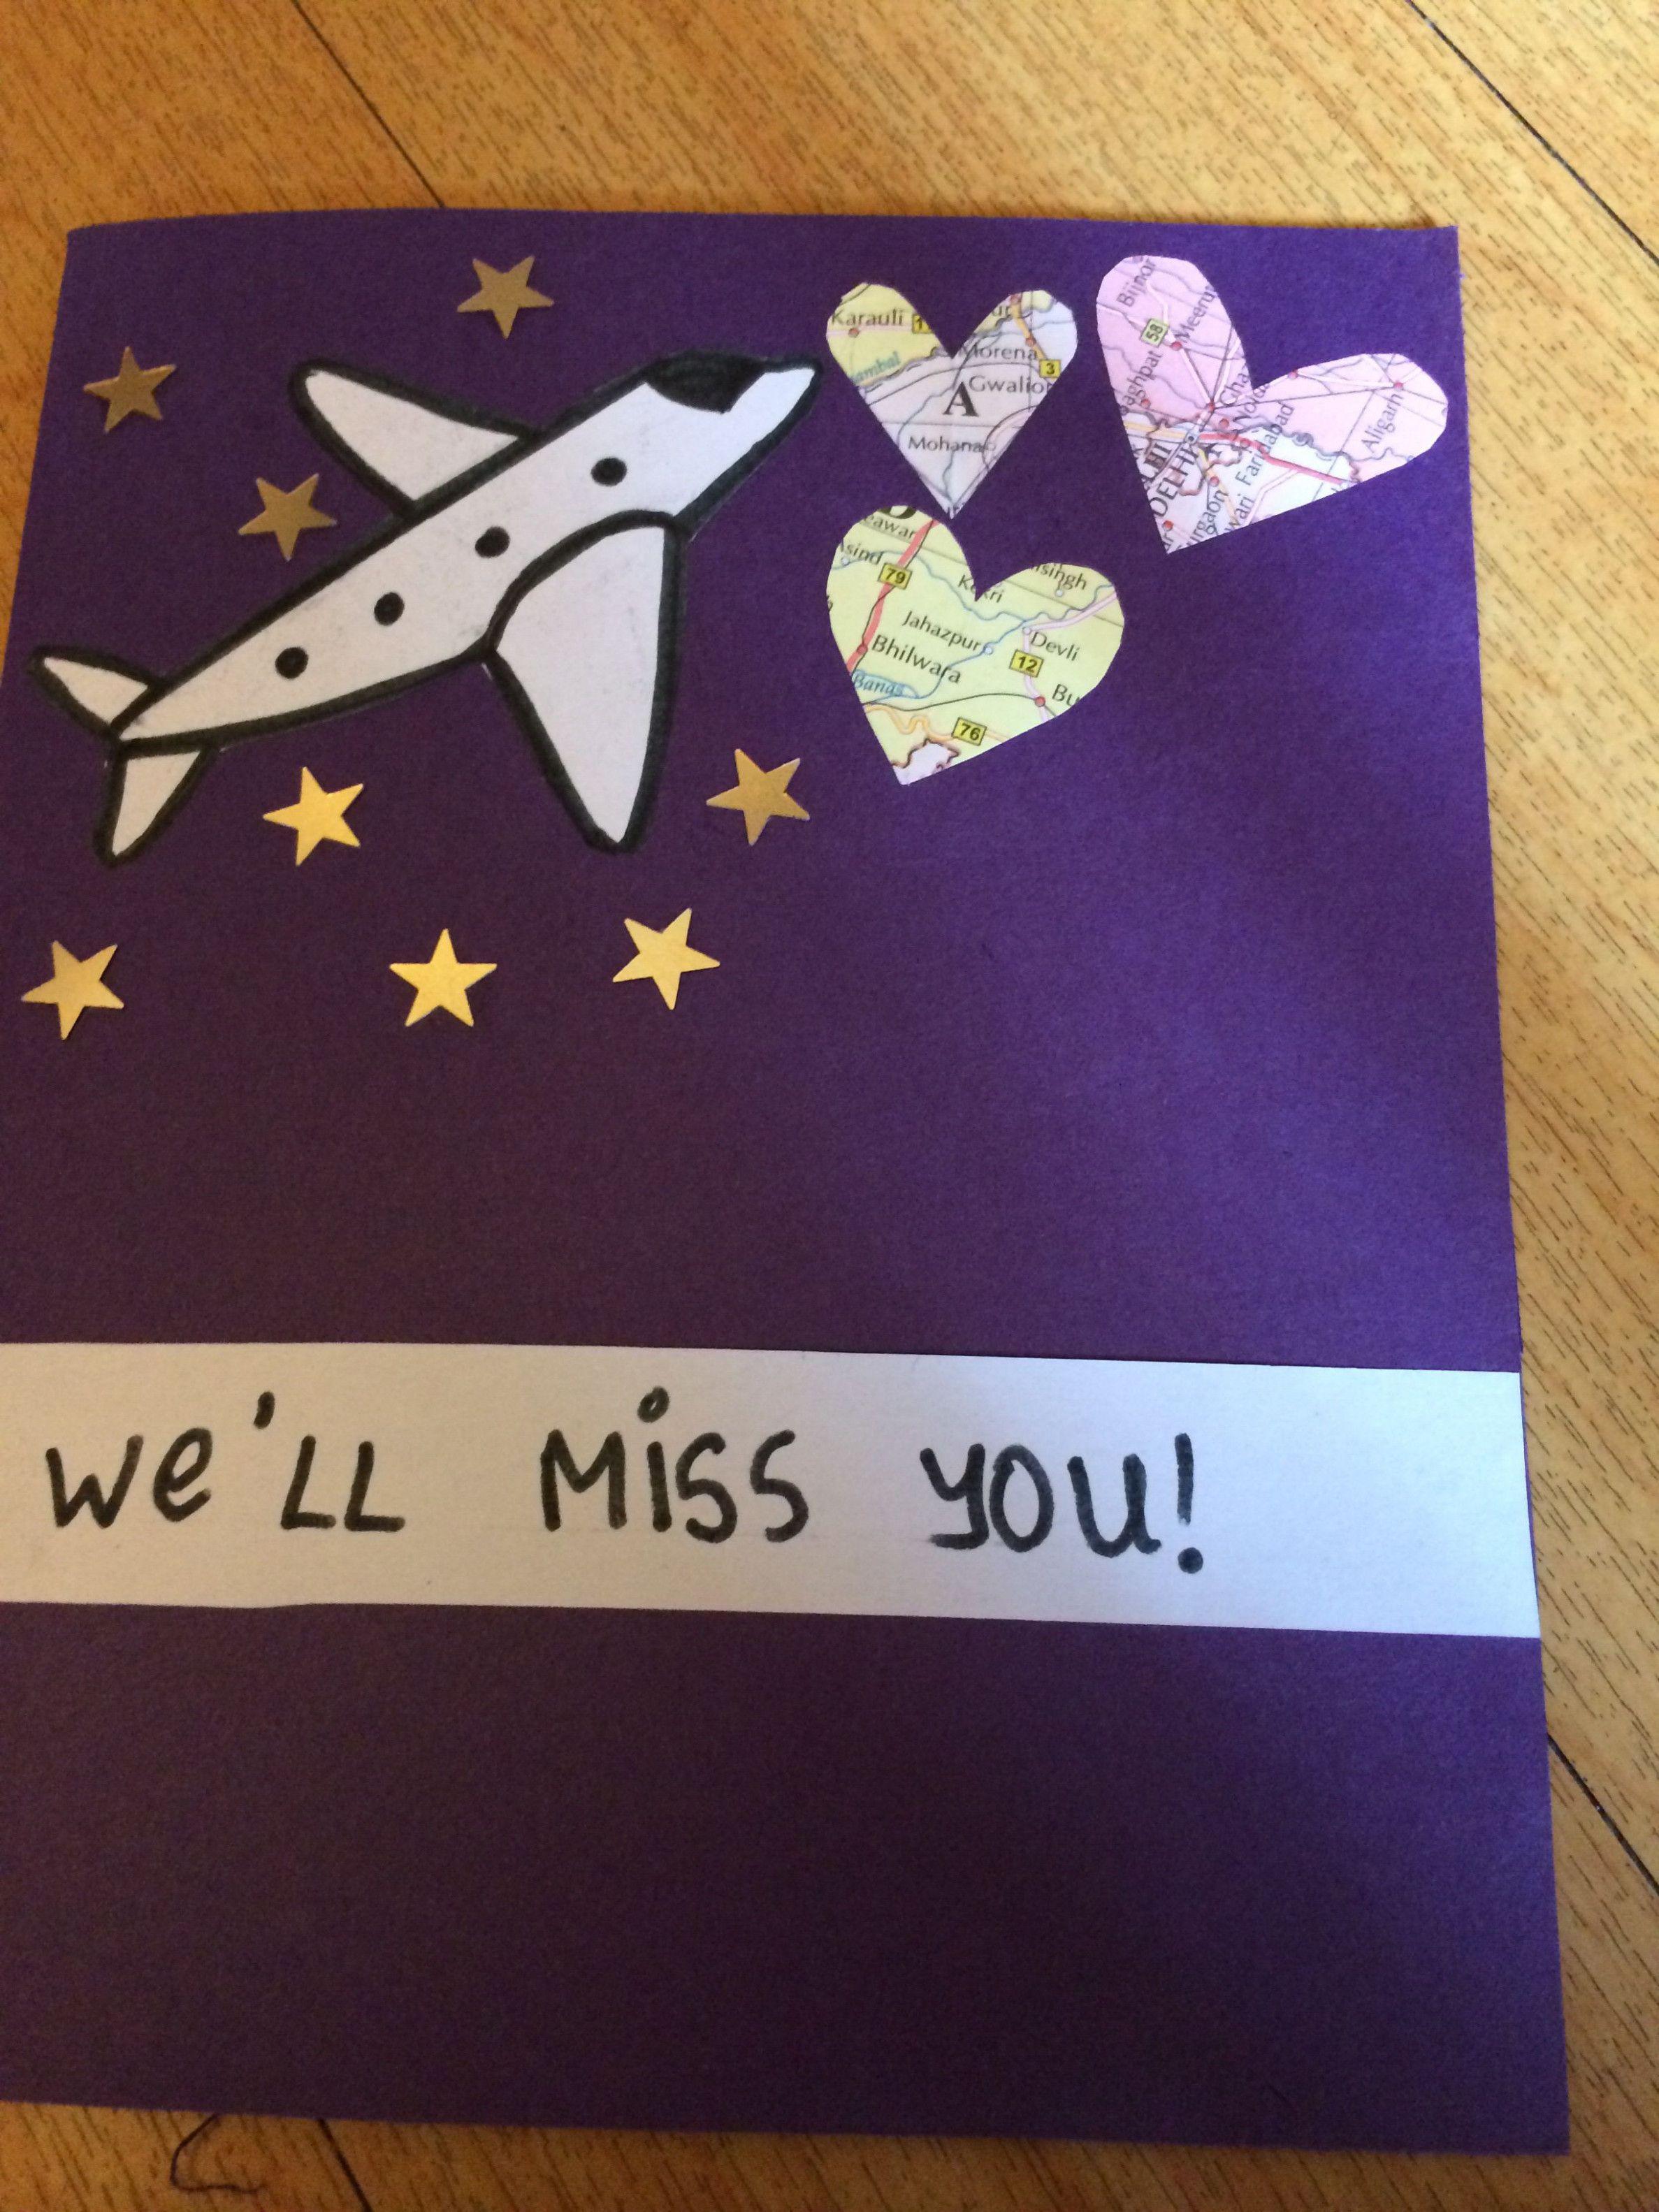 Farewell Card To Friend Beach Weddingdresses Com Farewell Cards Goodbye Cards Cards For Friends